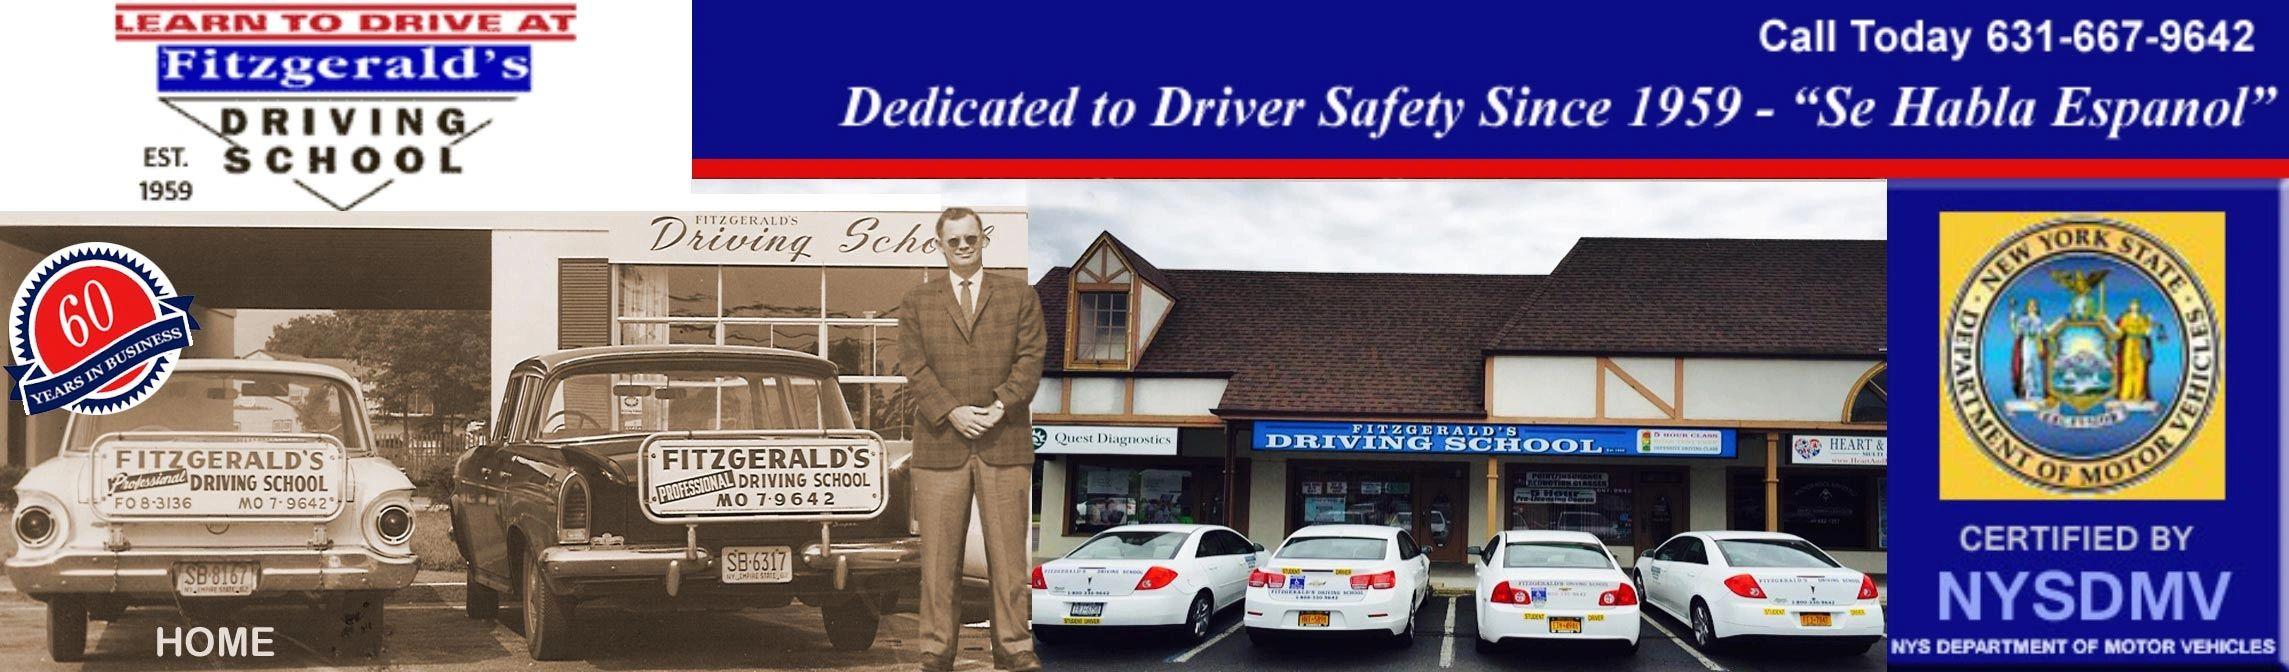 Ferrari Driving School New York >> Fitzgeralds Driving School